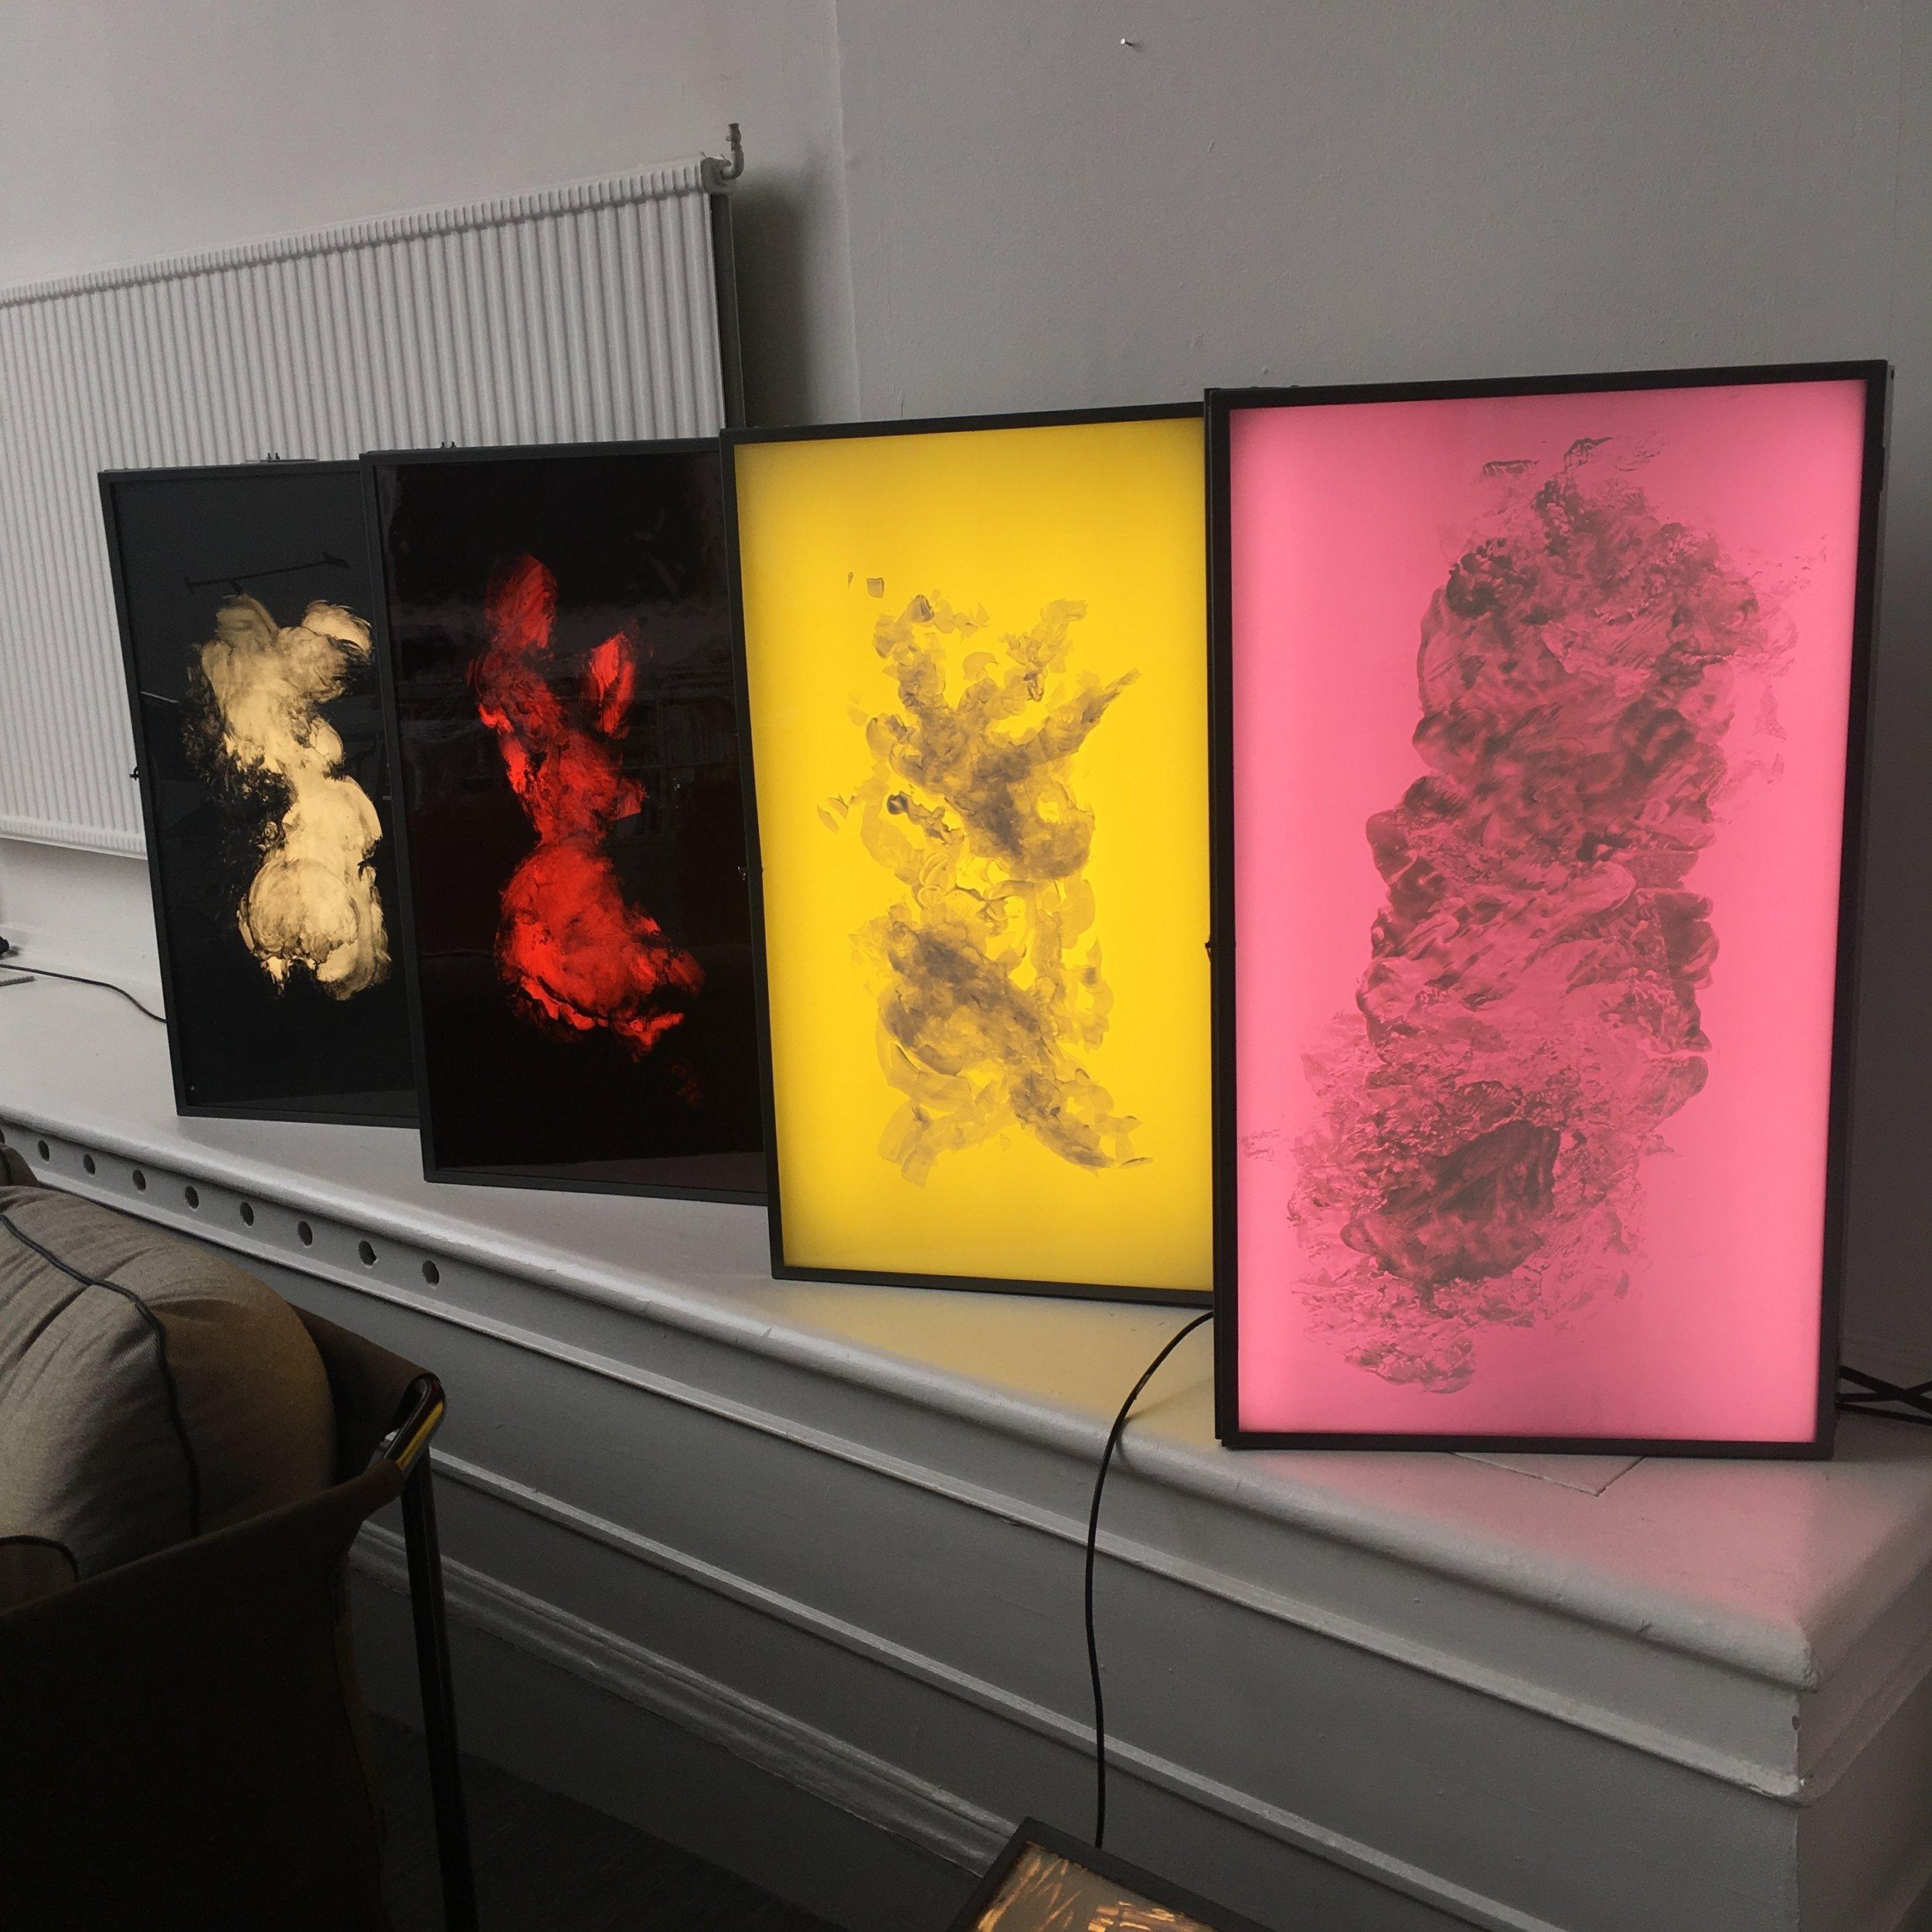 Kodak Woman Negative Series, paintings in vintage Kodak light boxes, some animated. Installation photos from Galleri Riis Showroom, Royal Academy of Fine Arts, Market Art Fair 2019.